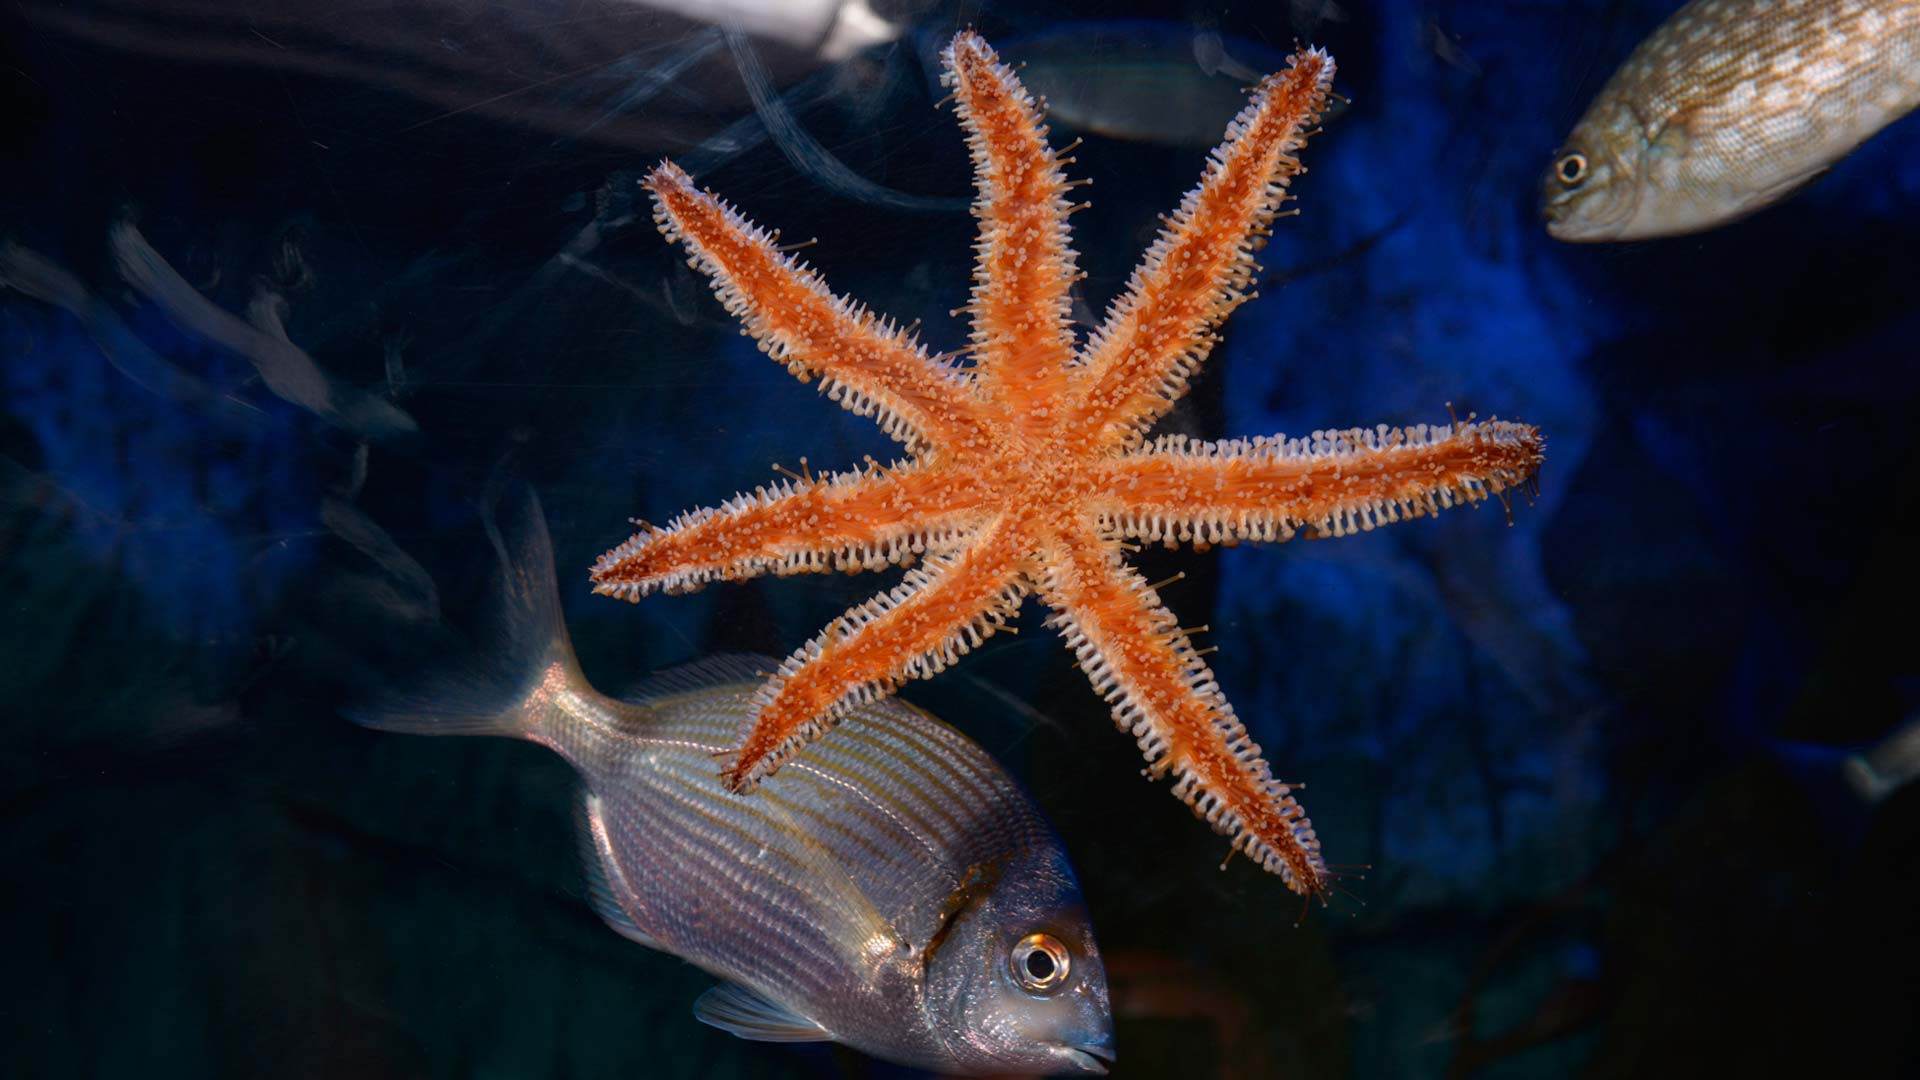 Blue spiny starfish